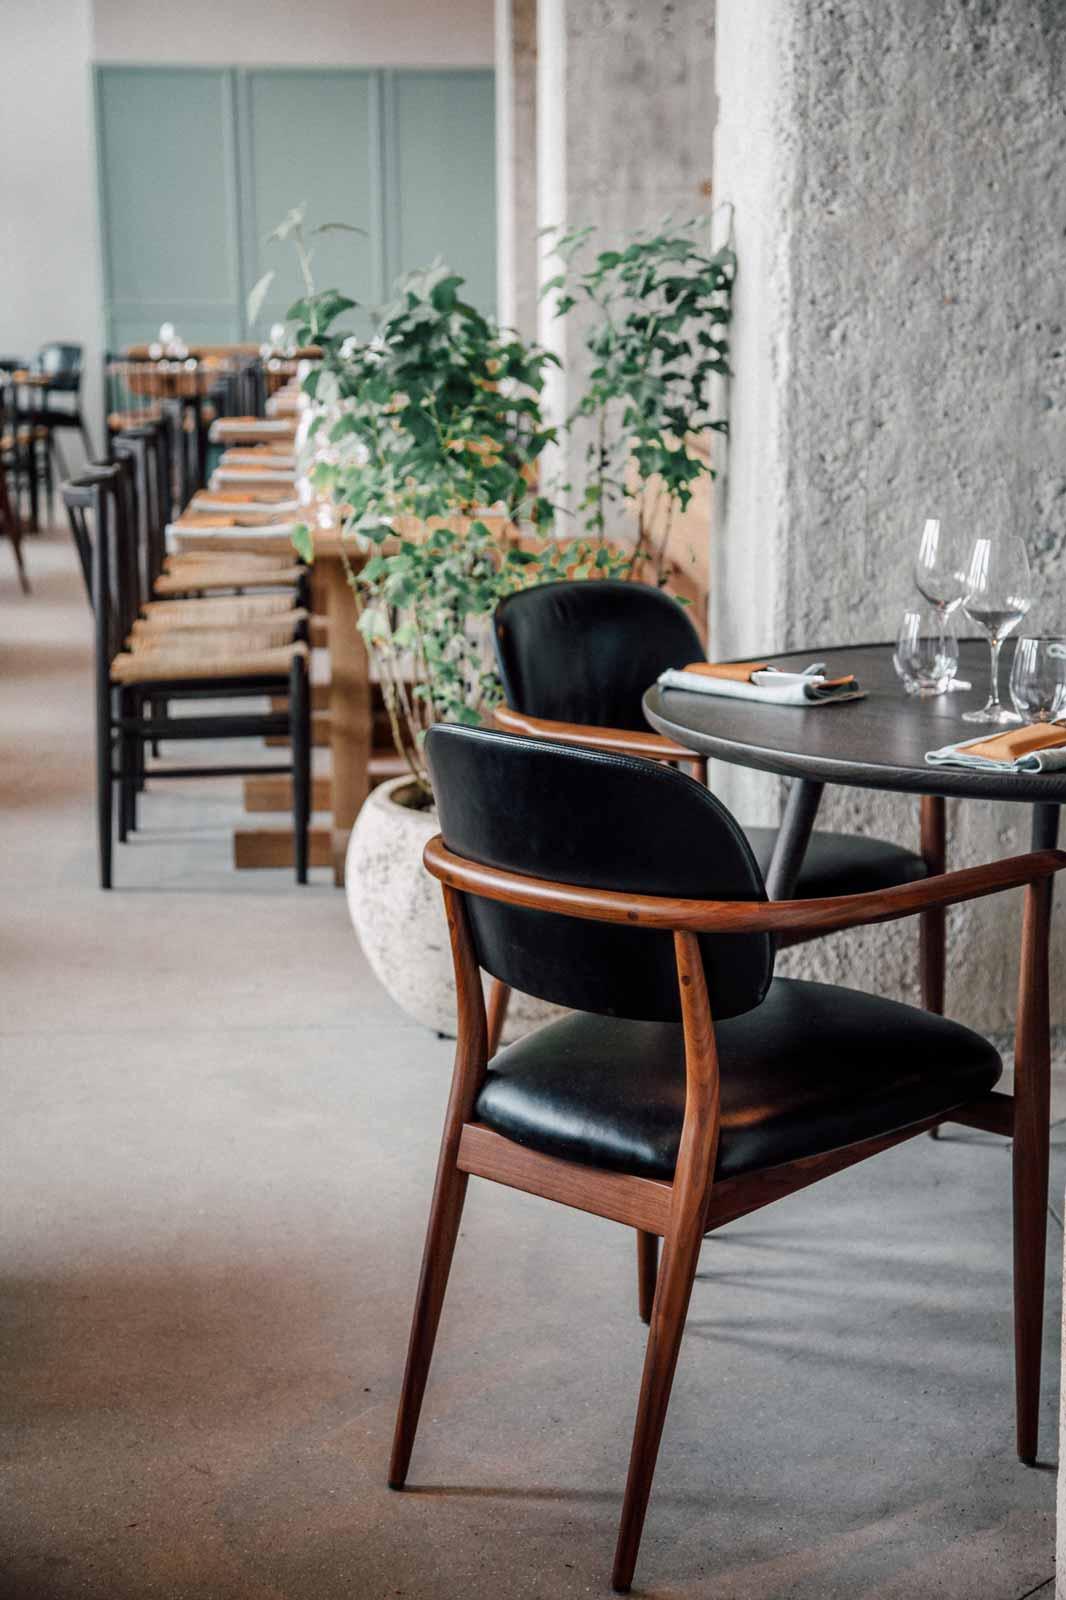 108 Restaurant